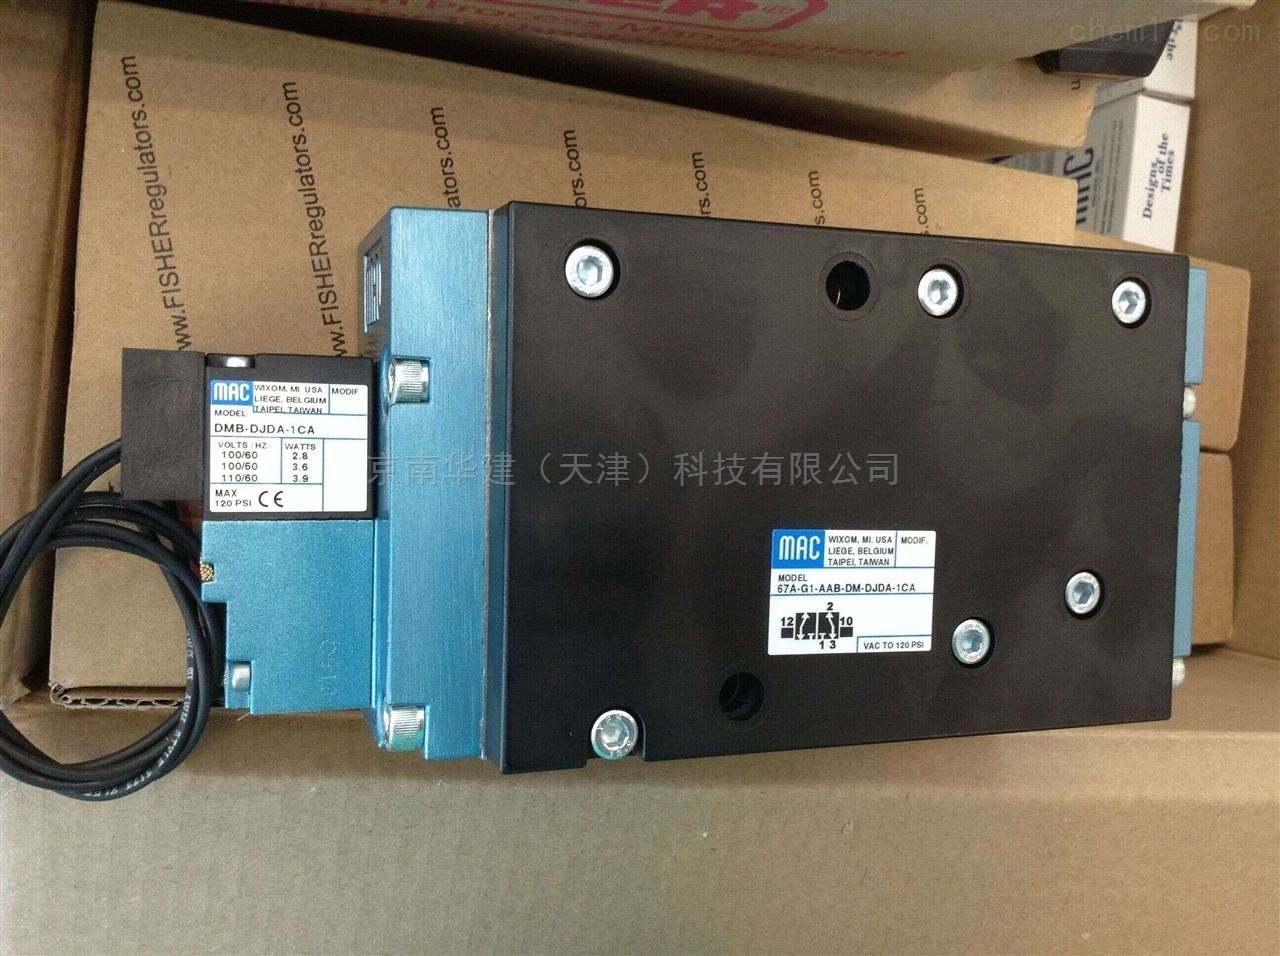 PPC5C-ABB-EGAA-DBA-IB 电磁阀大量库存